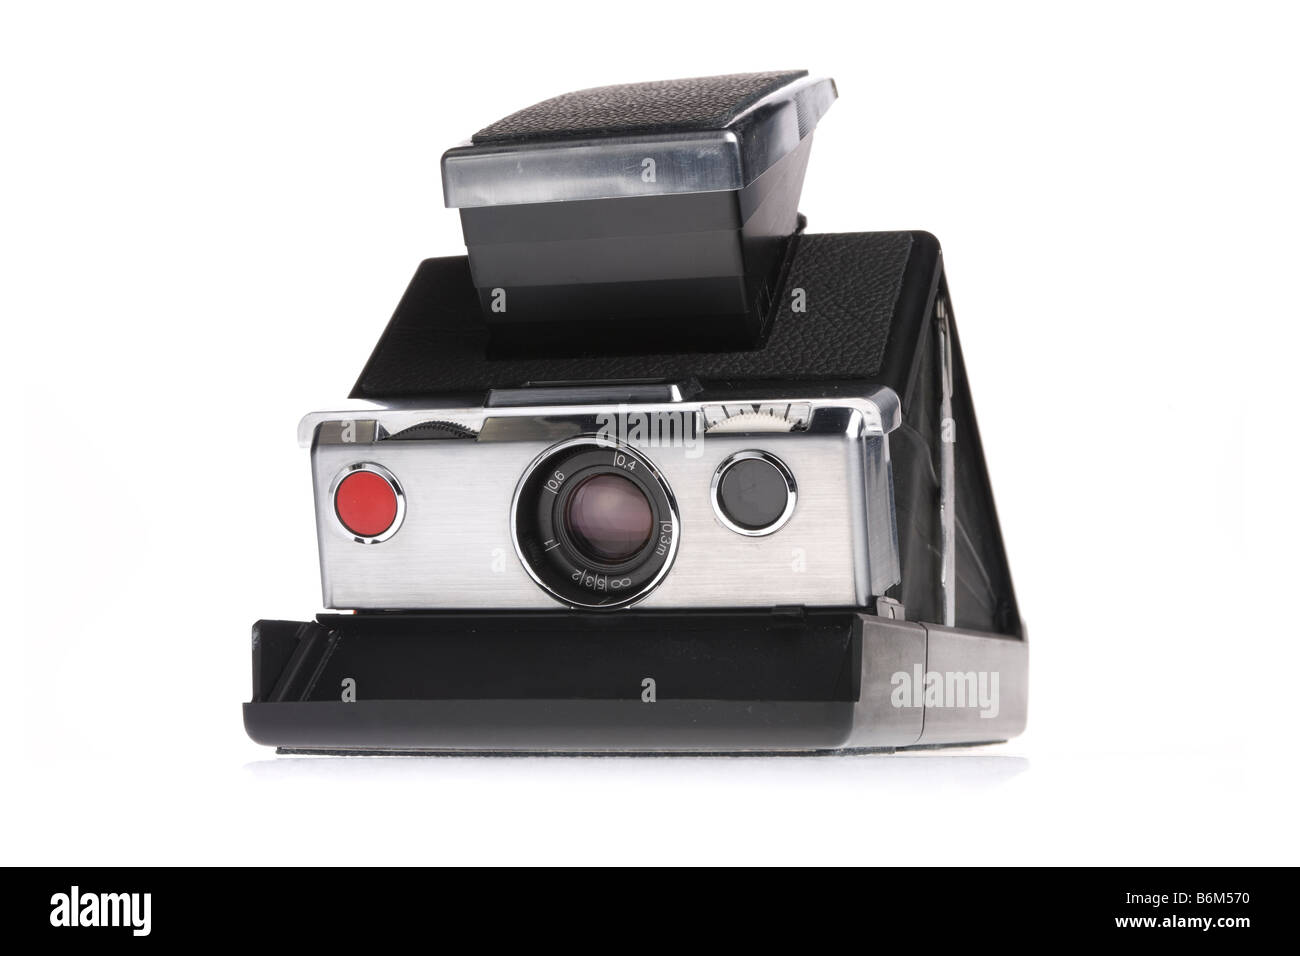 Polaroid Camera Urban Outfitters Uk : Polaroid cameras stock photos polaroid cameras stock images